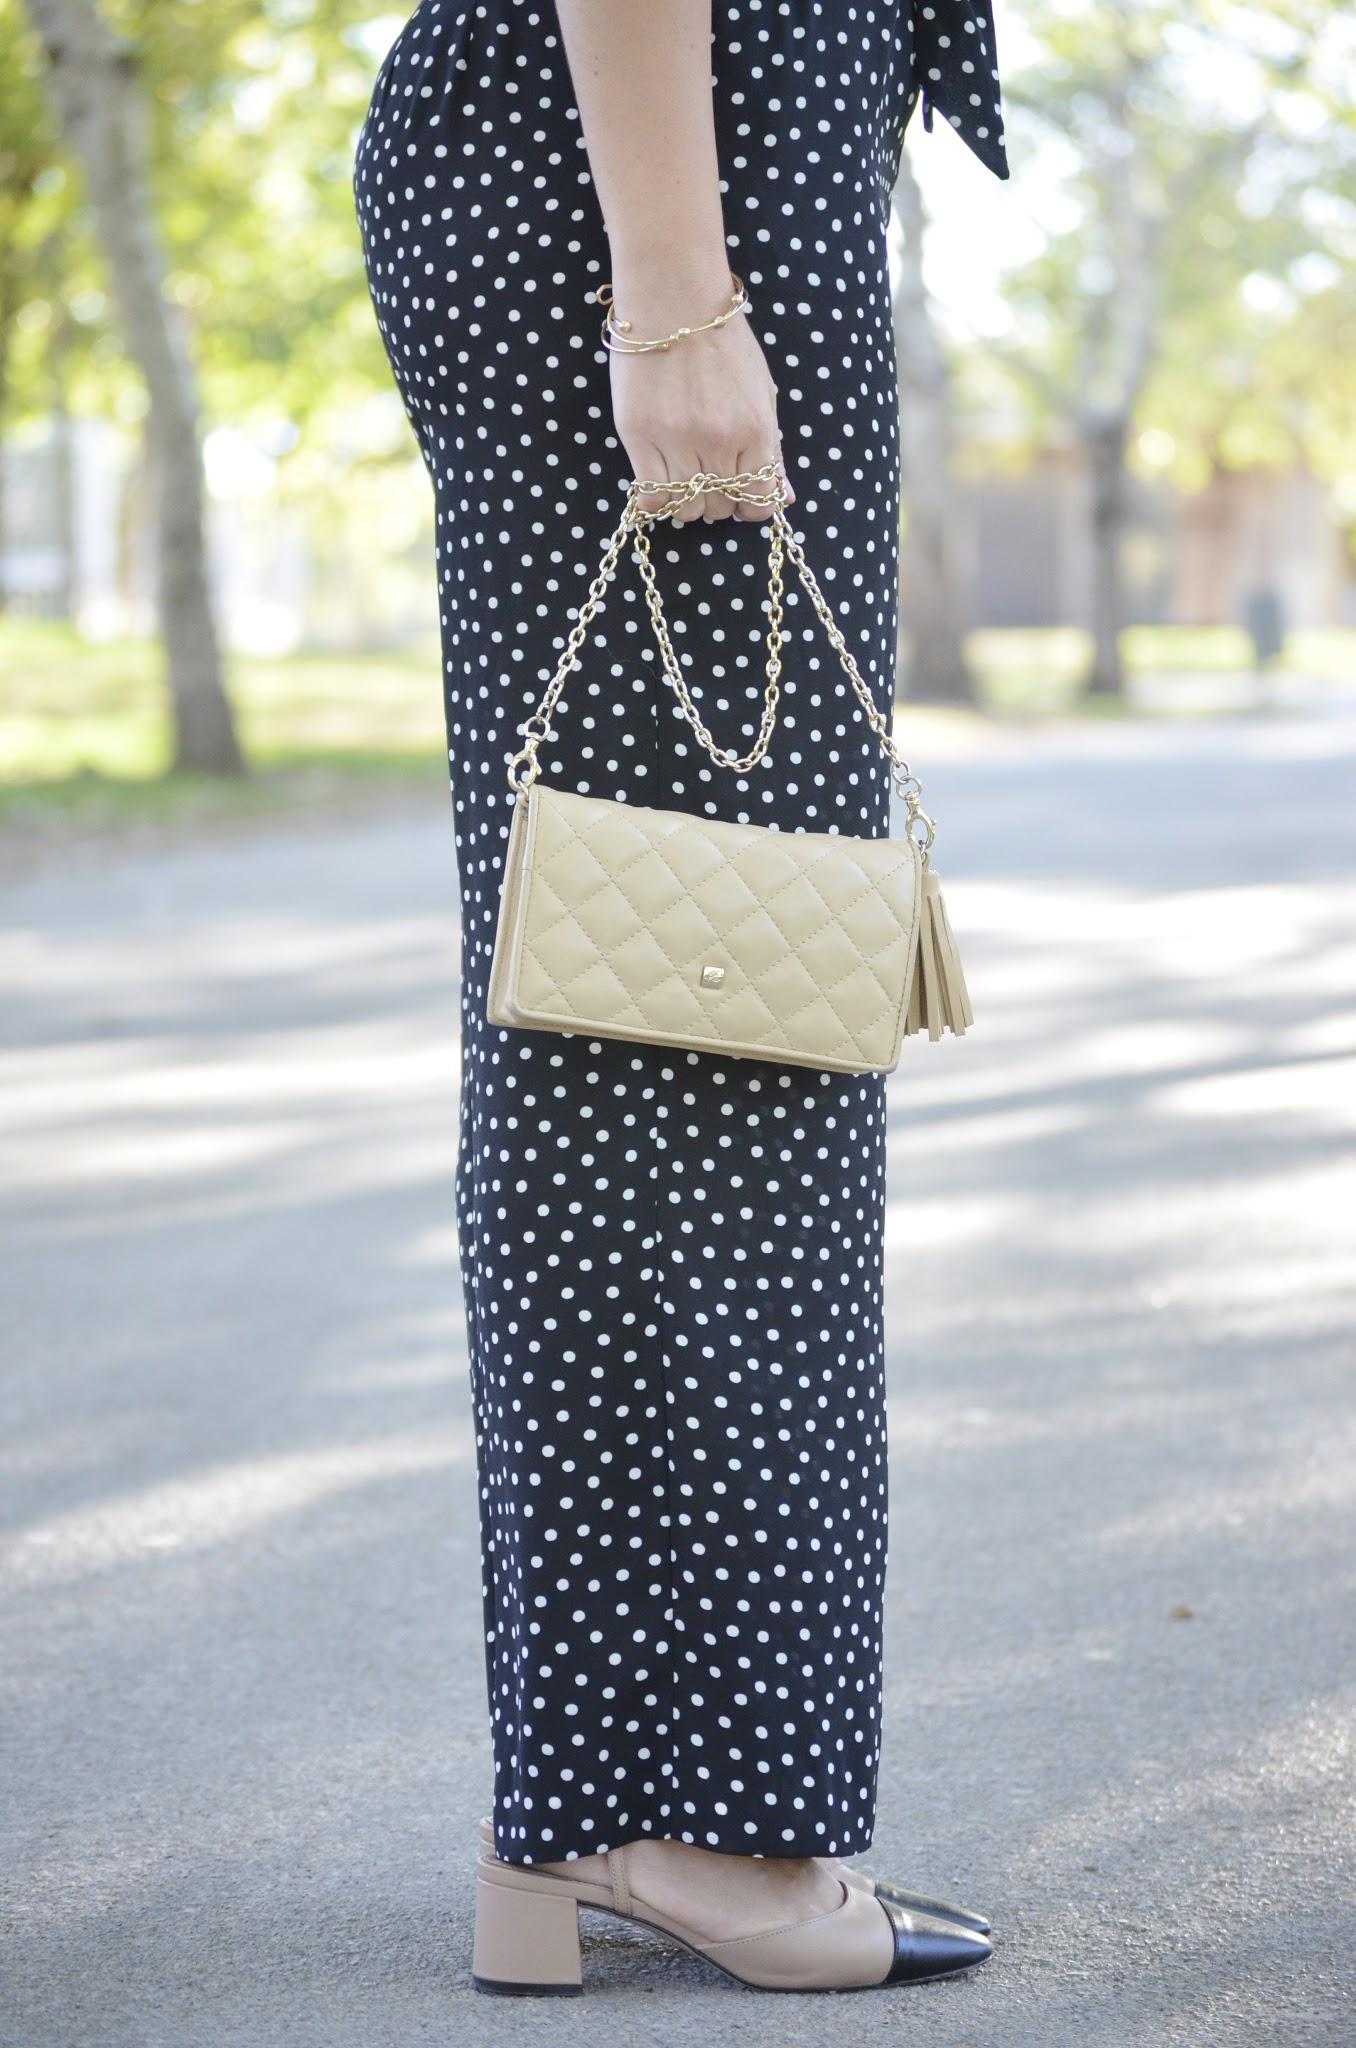 clon_chanel_slingback_trend_fashionista